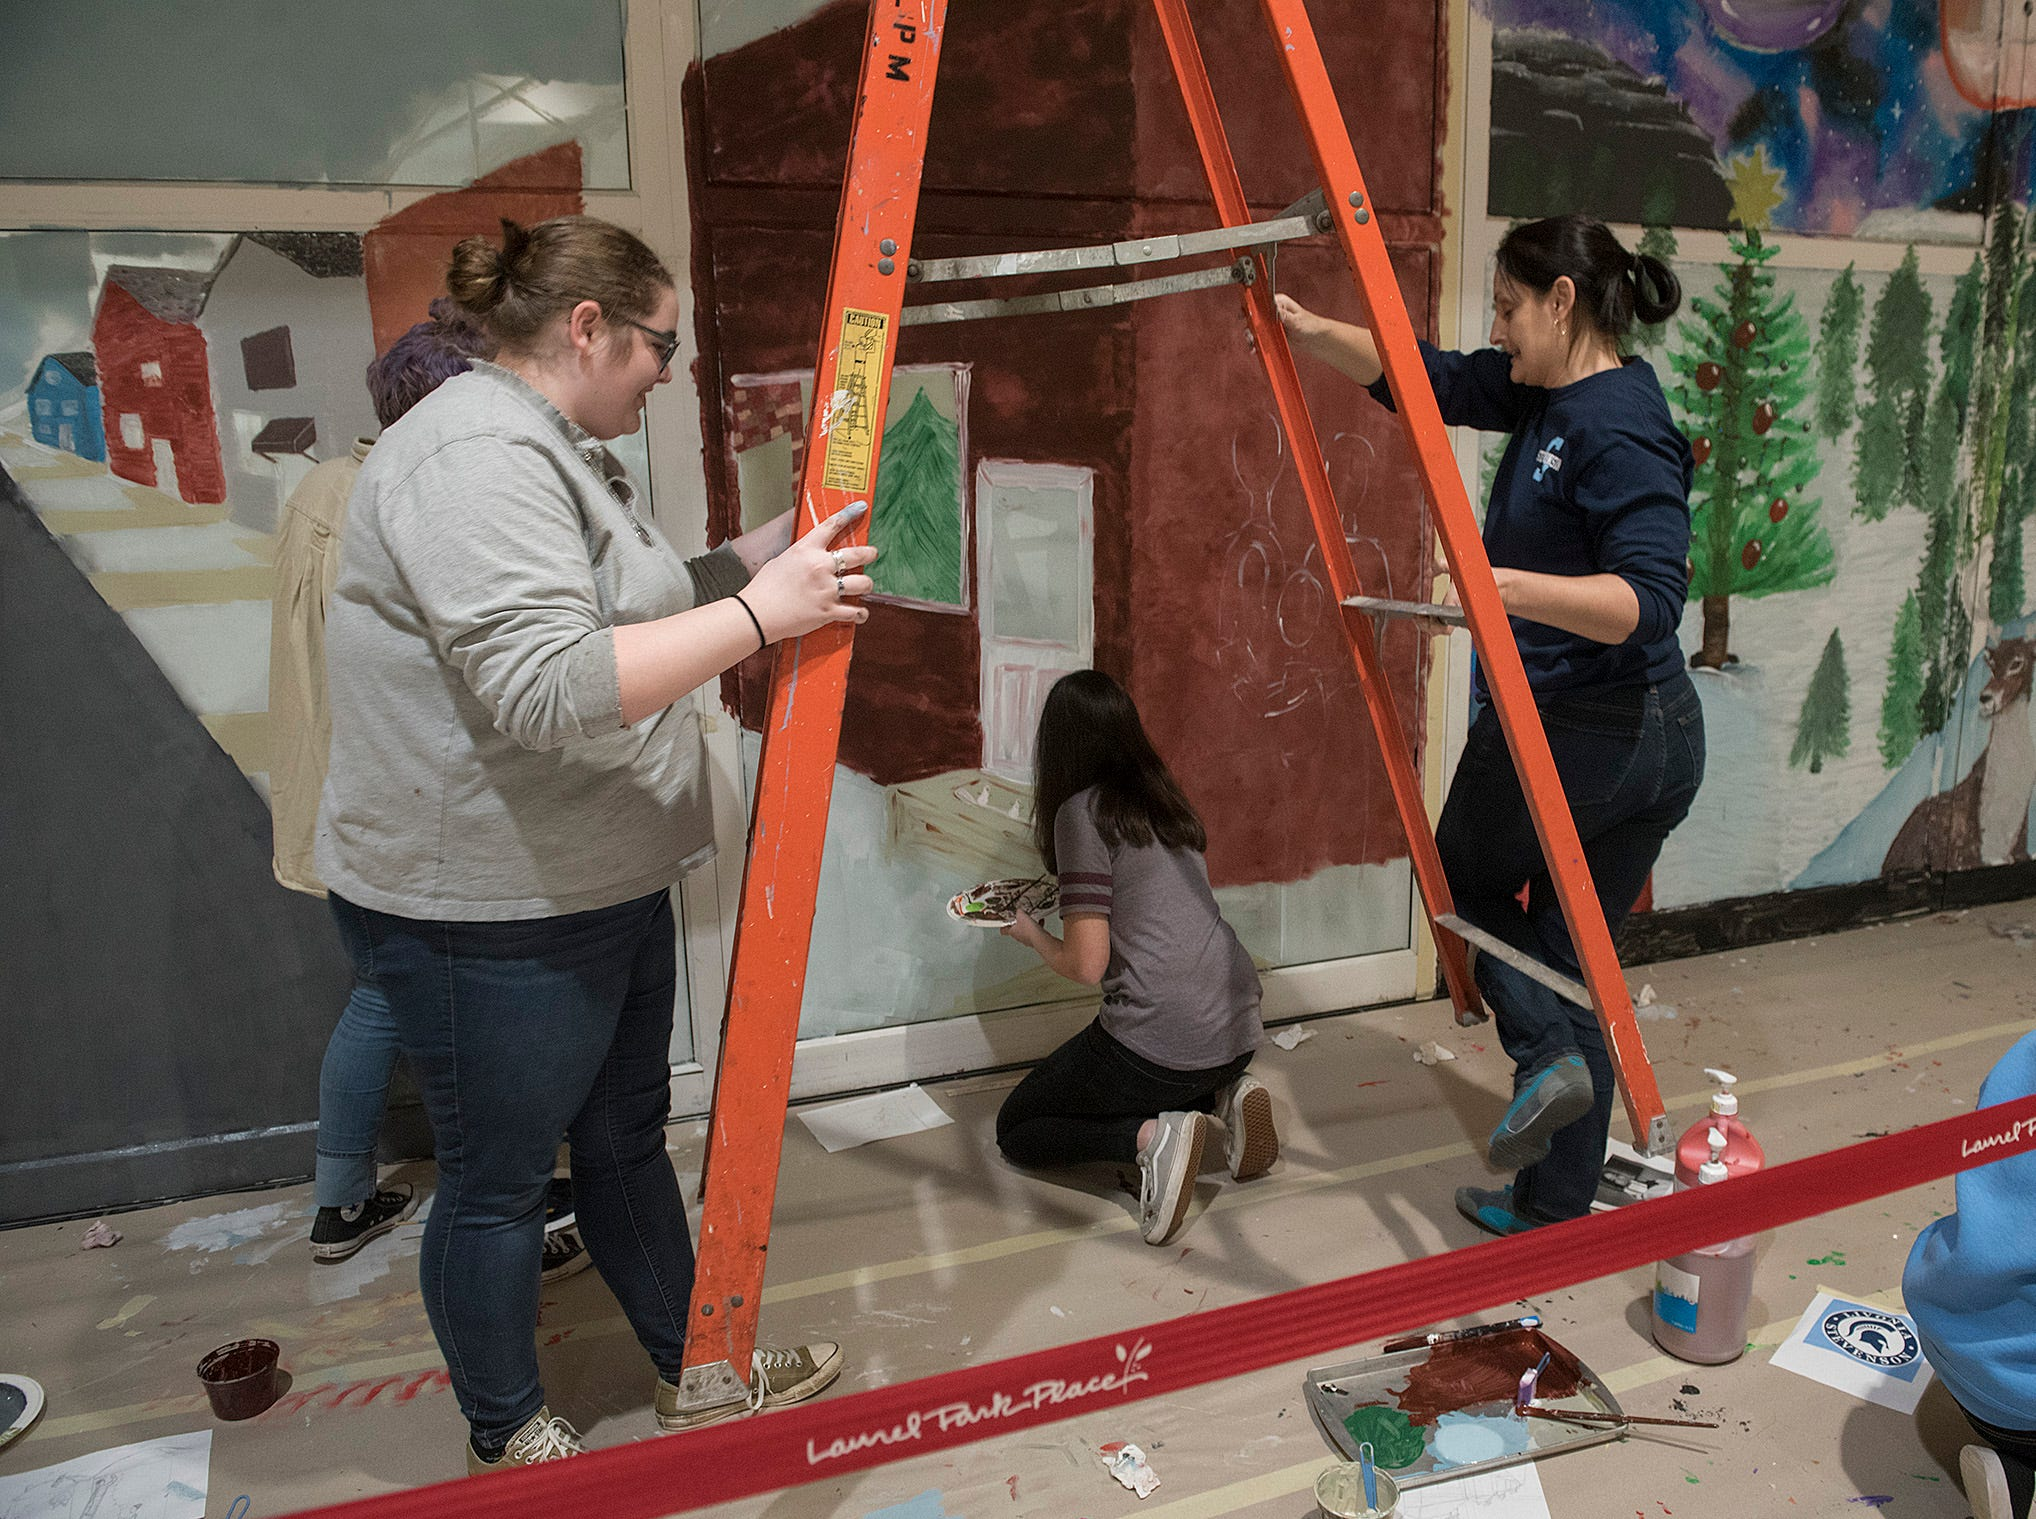 Meghan McQuiston and art teacher Heidi Posh move a ladder into place, carefully avoiding Emily Dobao.